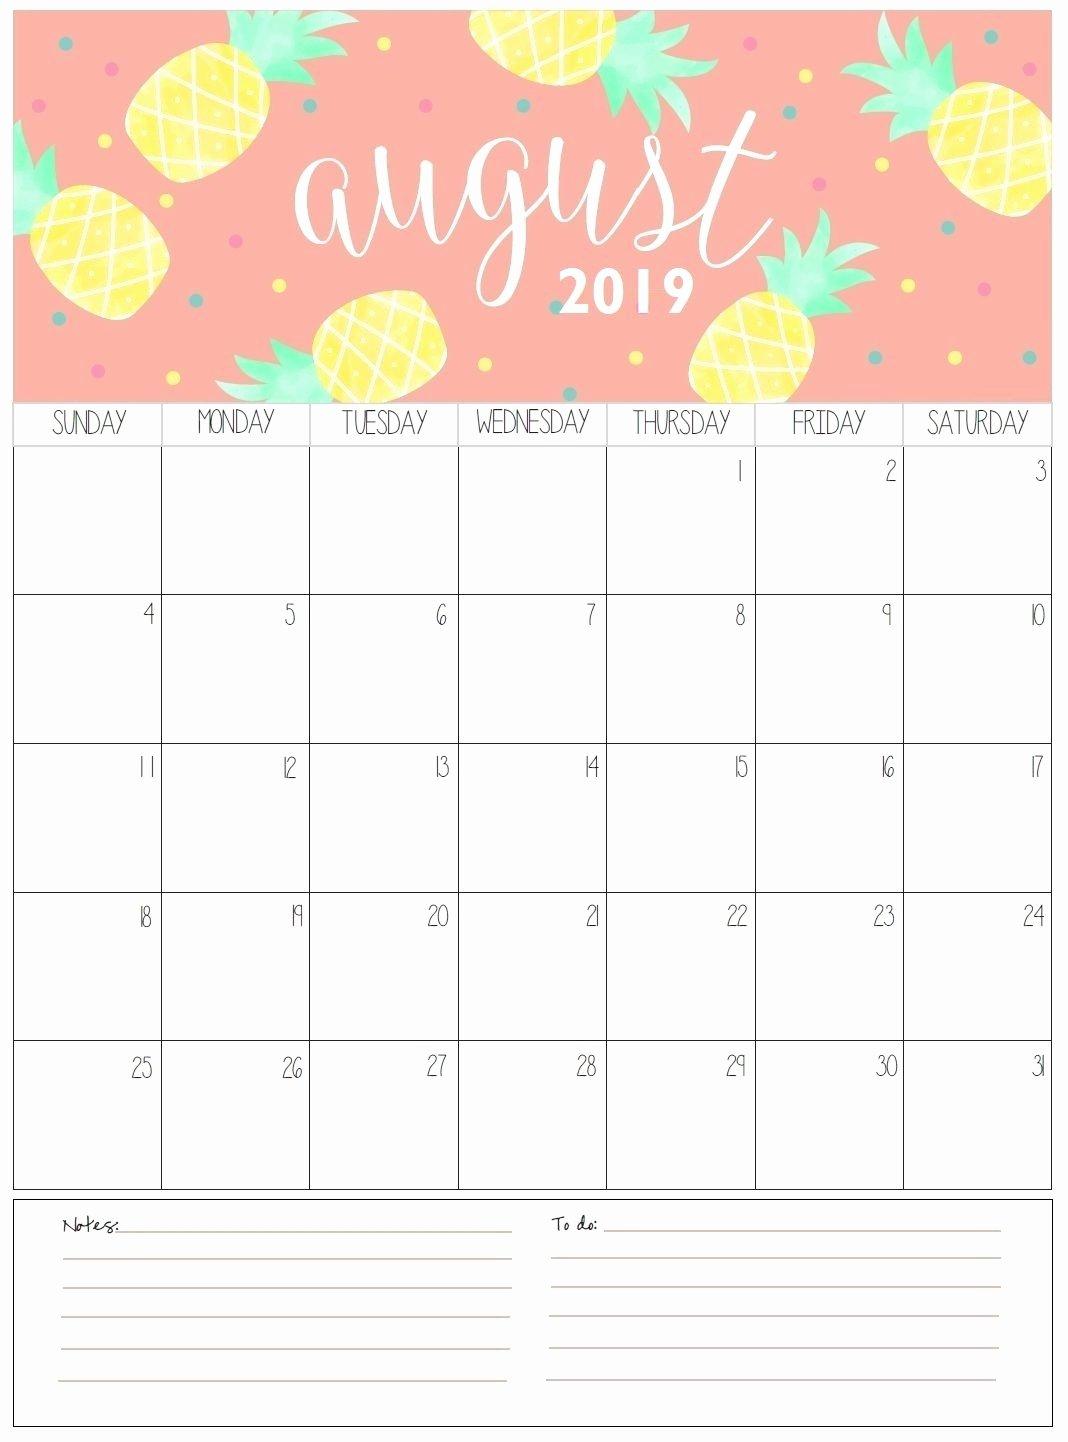 Cute Calendar Template 2019 Beautiful Take August Calendar Printable 2019 Cute ⋆ the Best